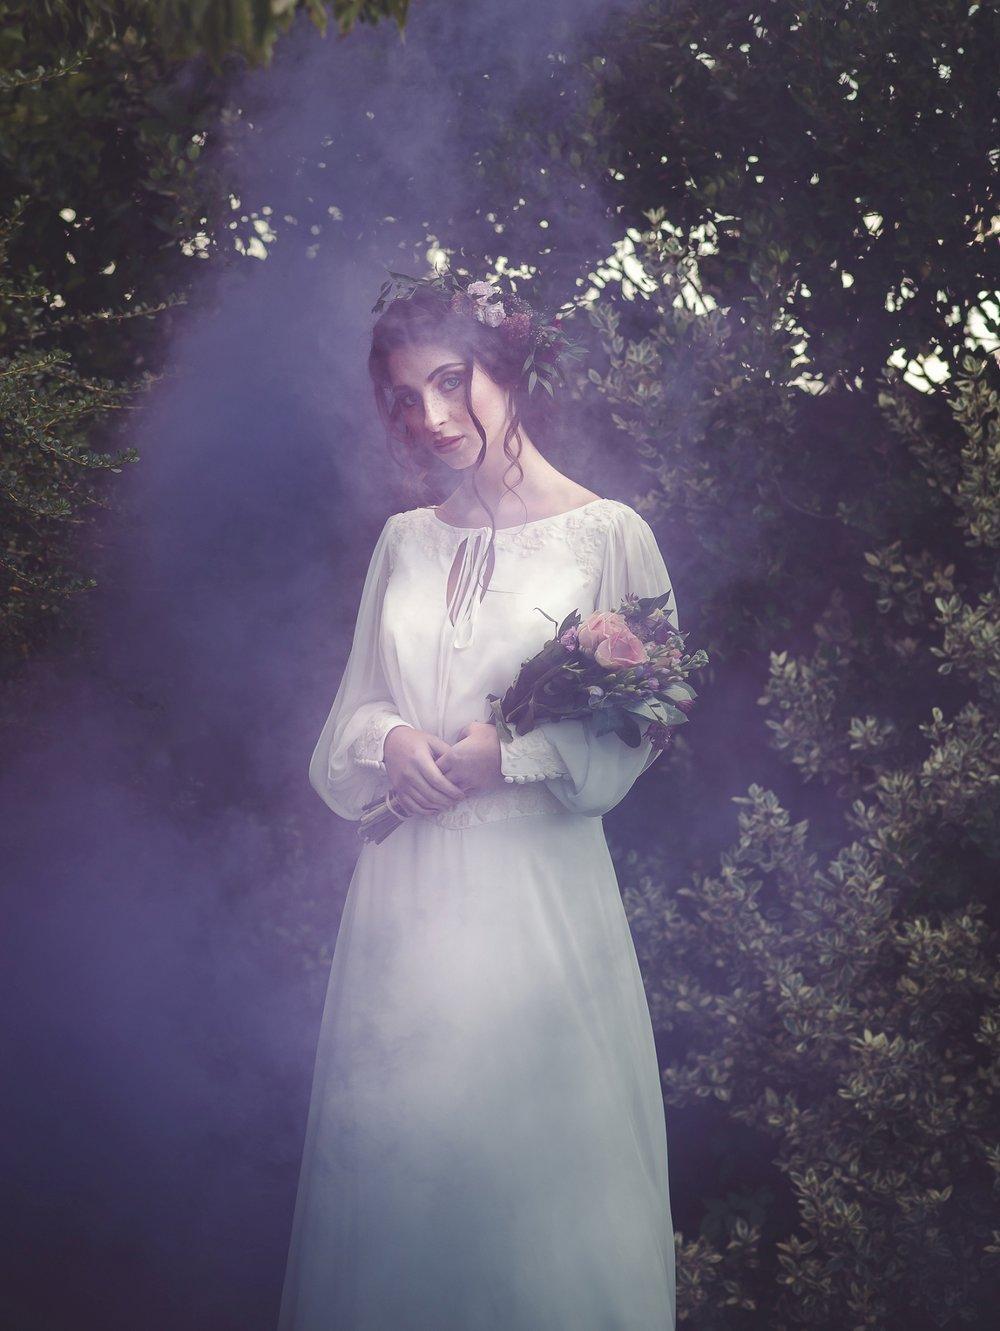 Curradine_bridal_Sept_17_amytiphoto_0073.jpg